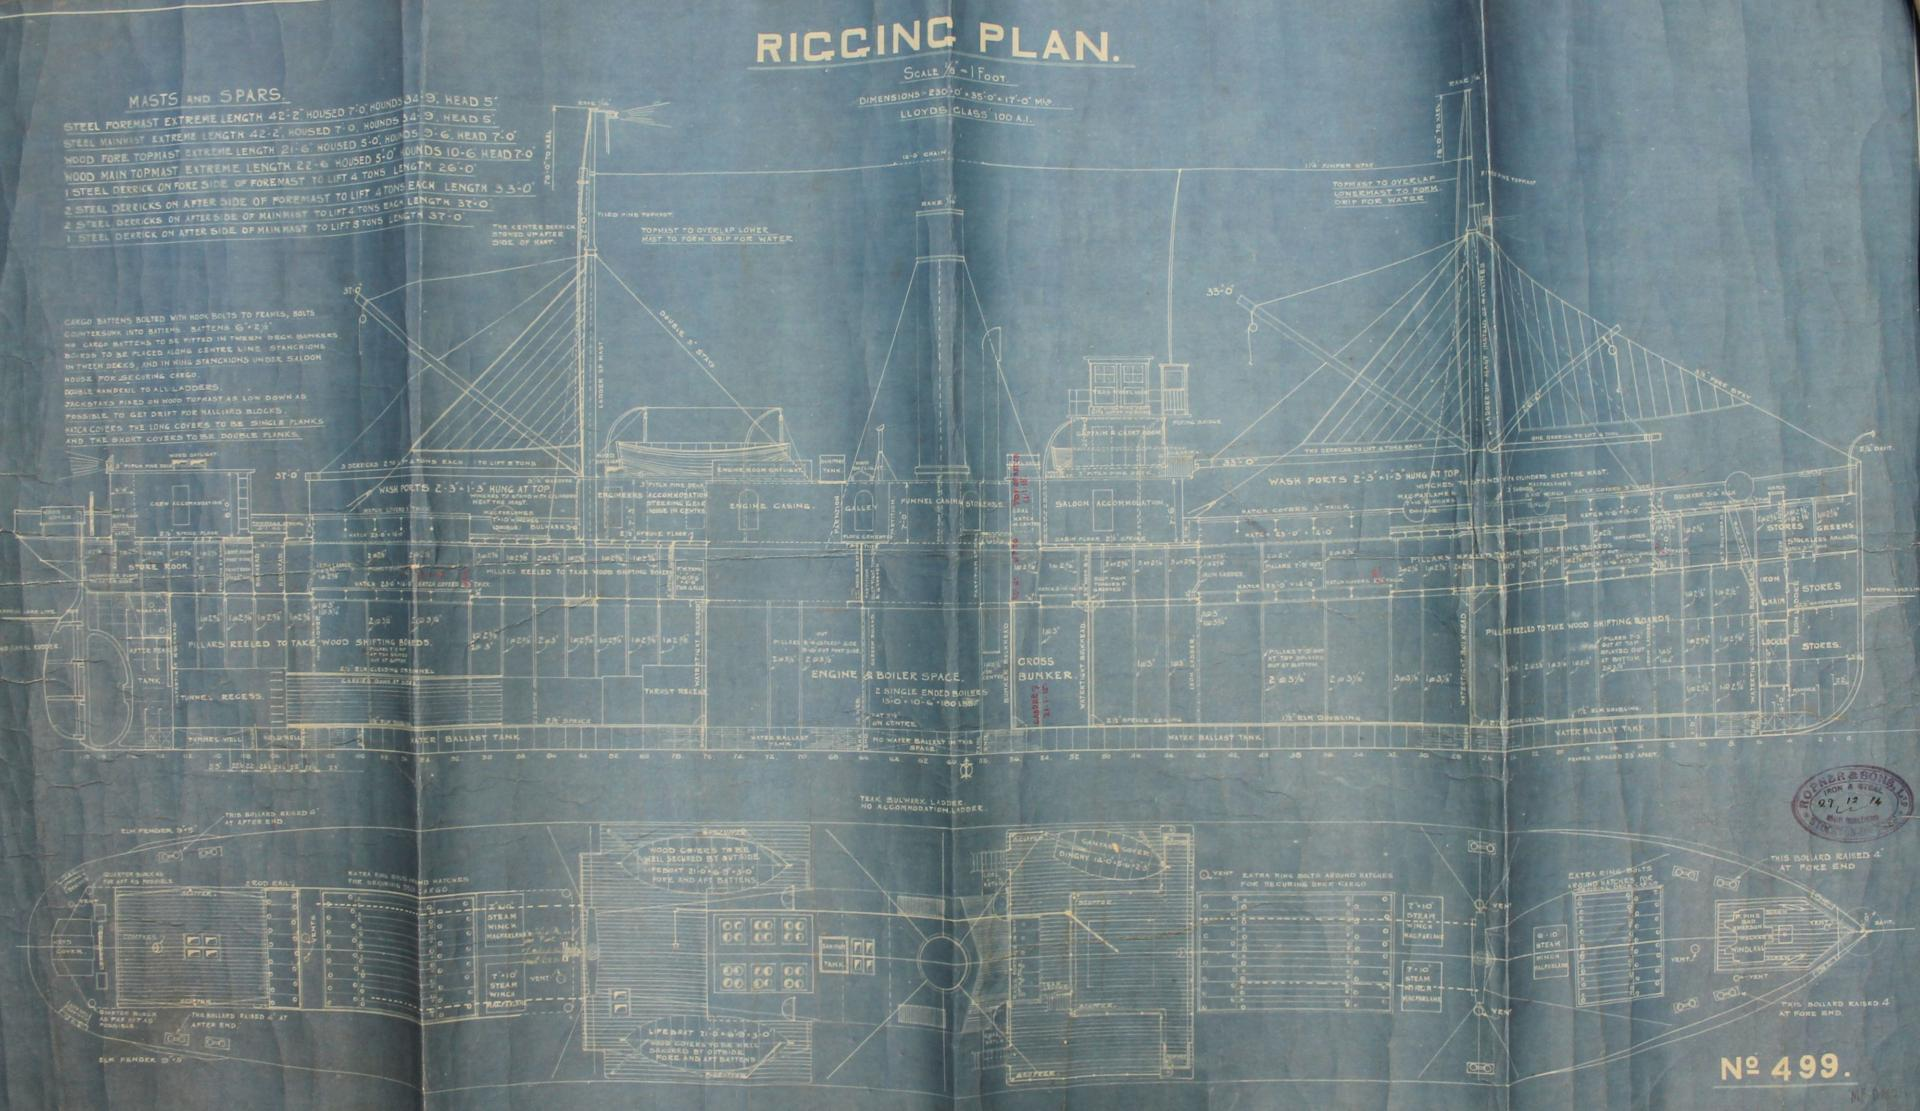 Halberdier Rigging Plan